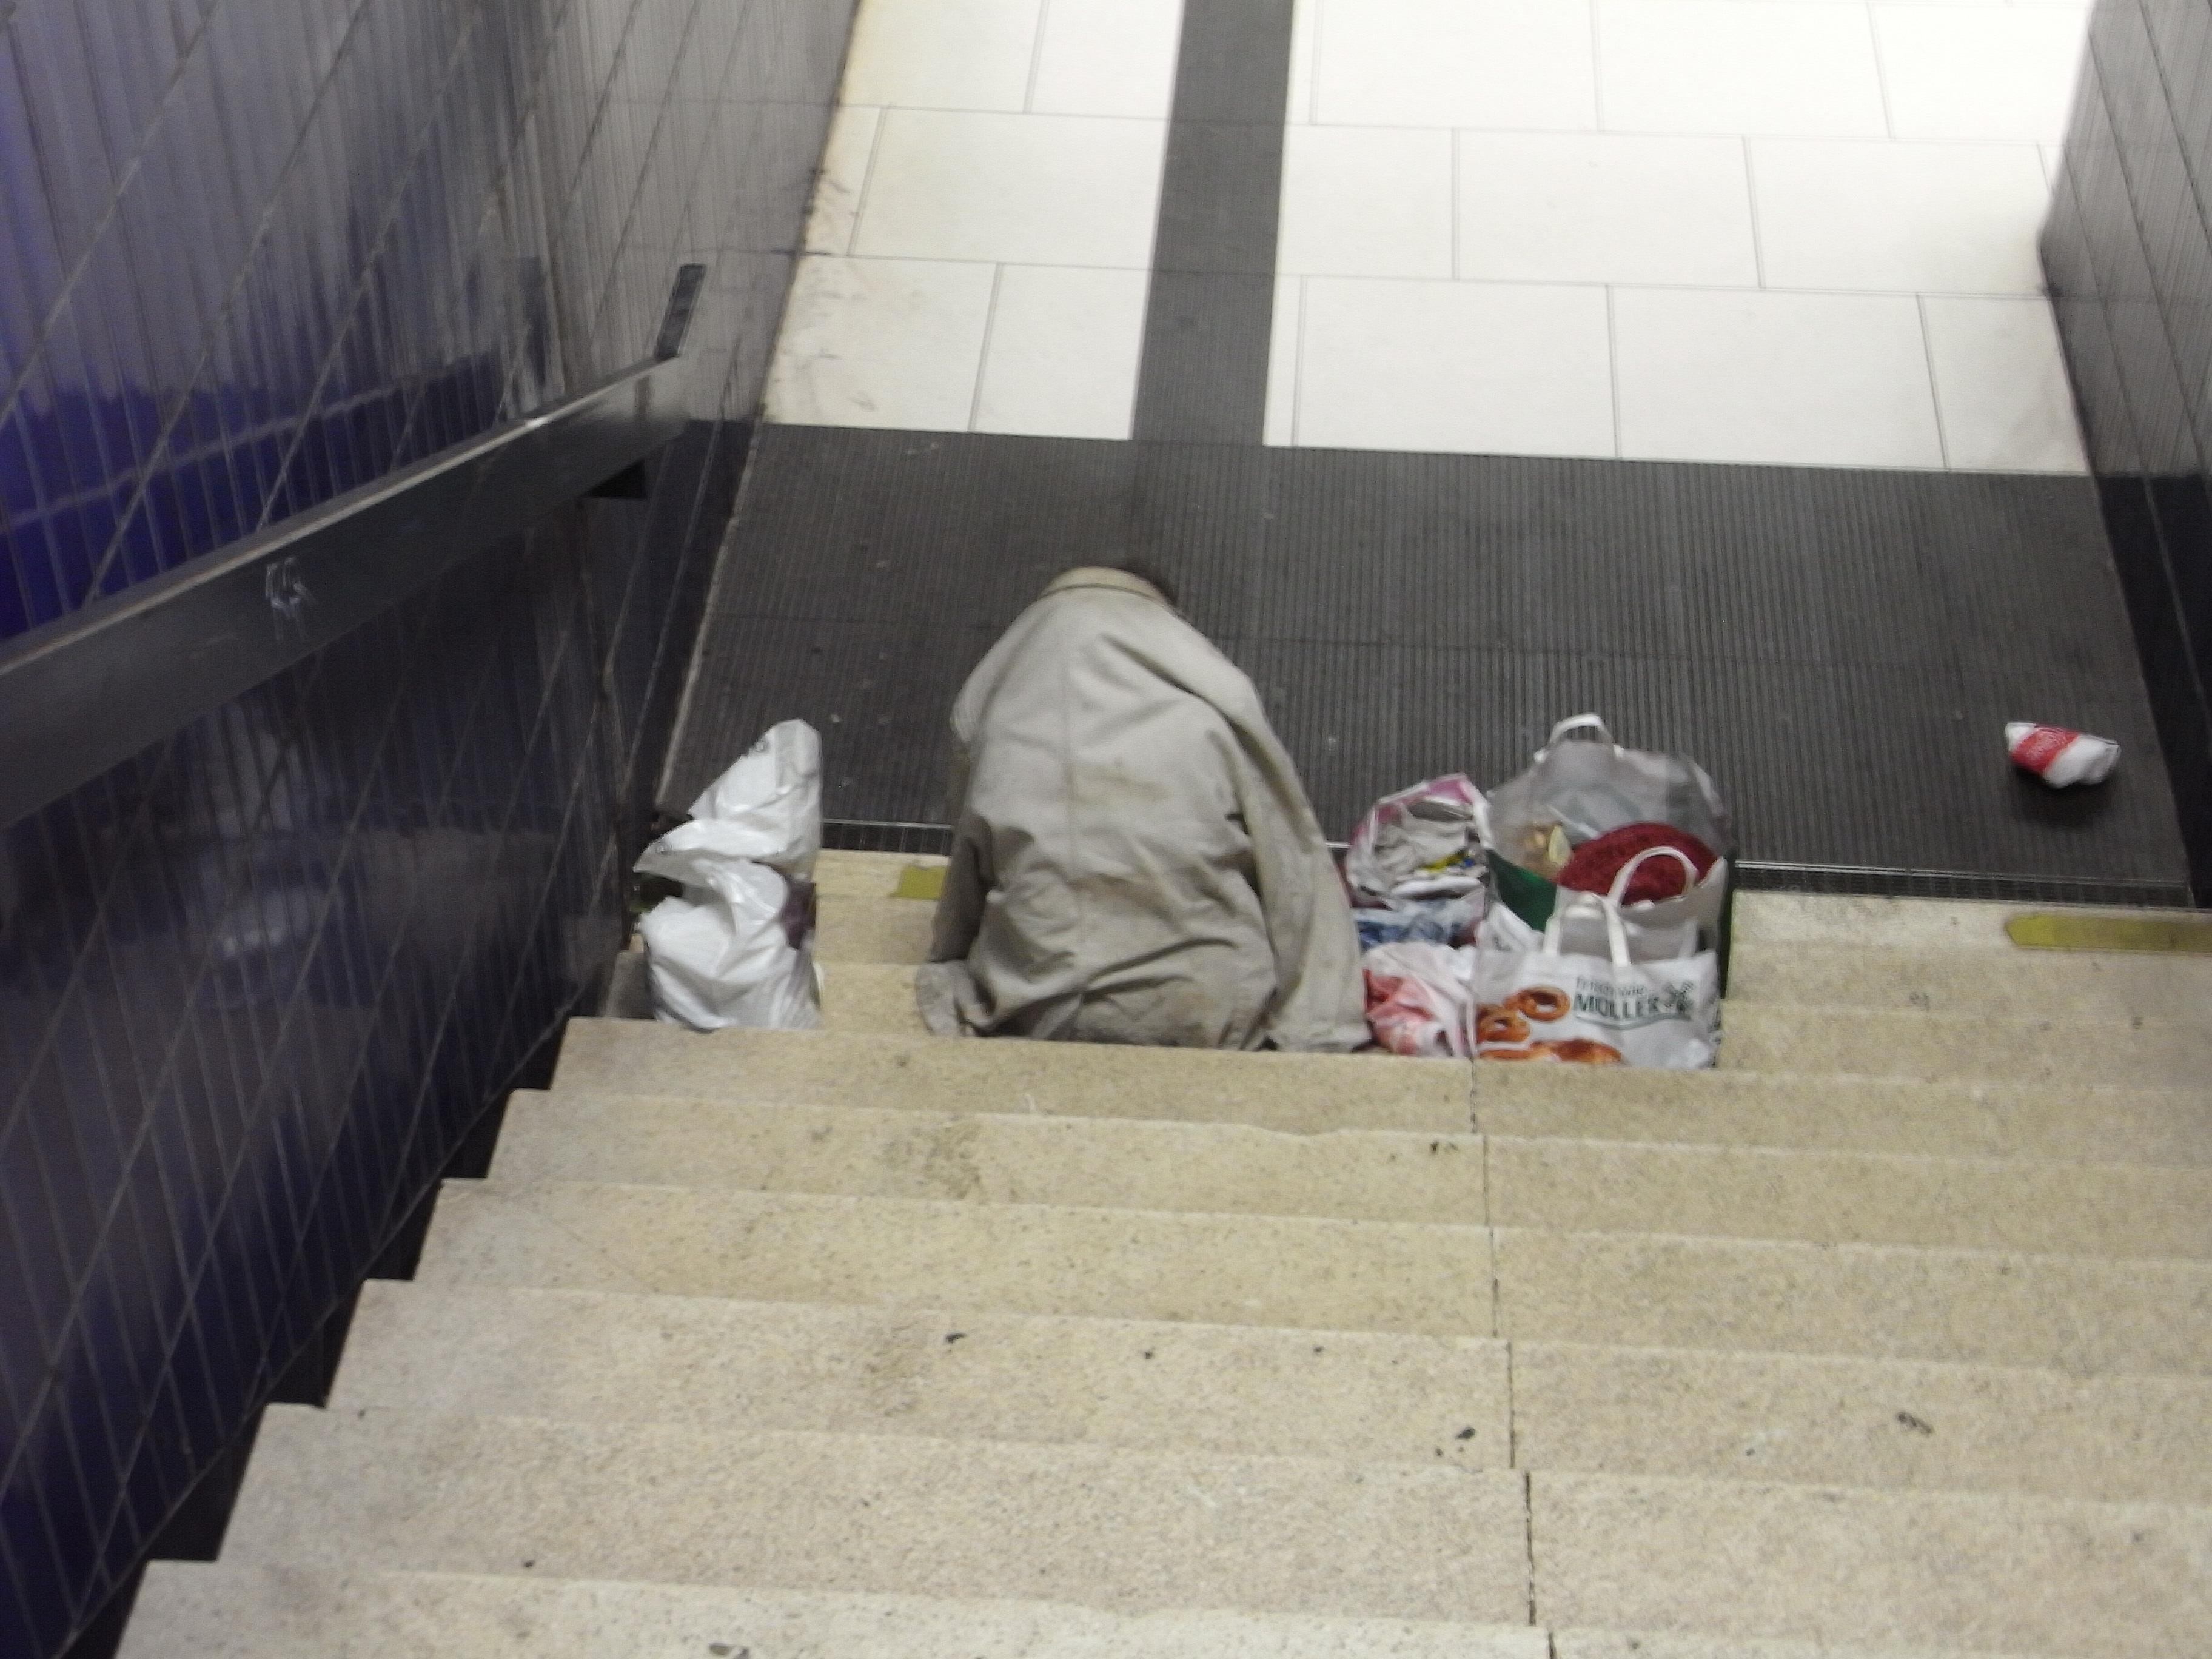 Bettlerin in U-Bahnhof in München